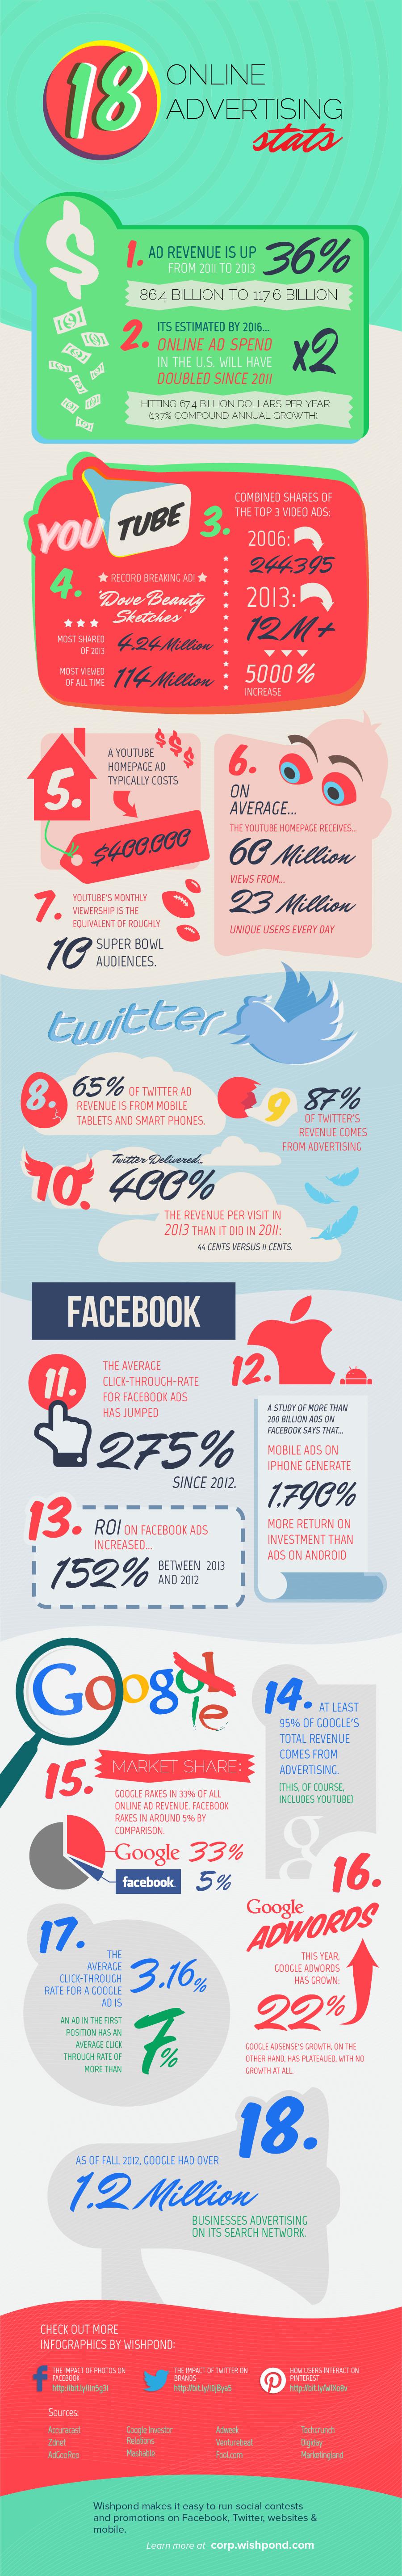 18 Online Advertising Statistics